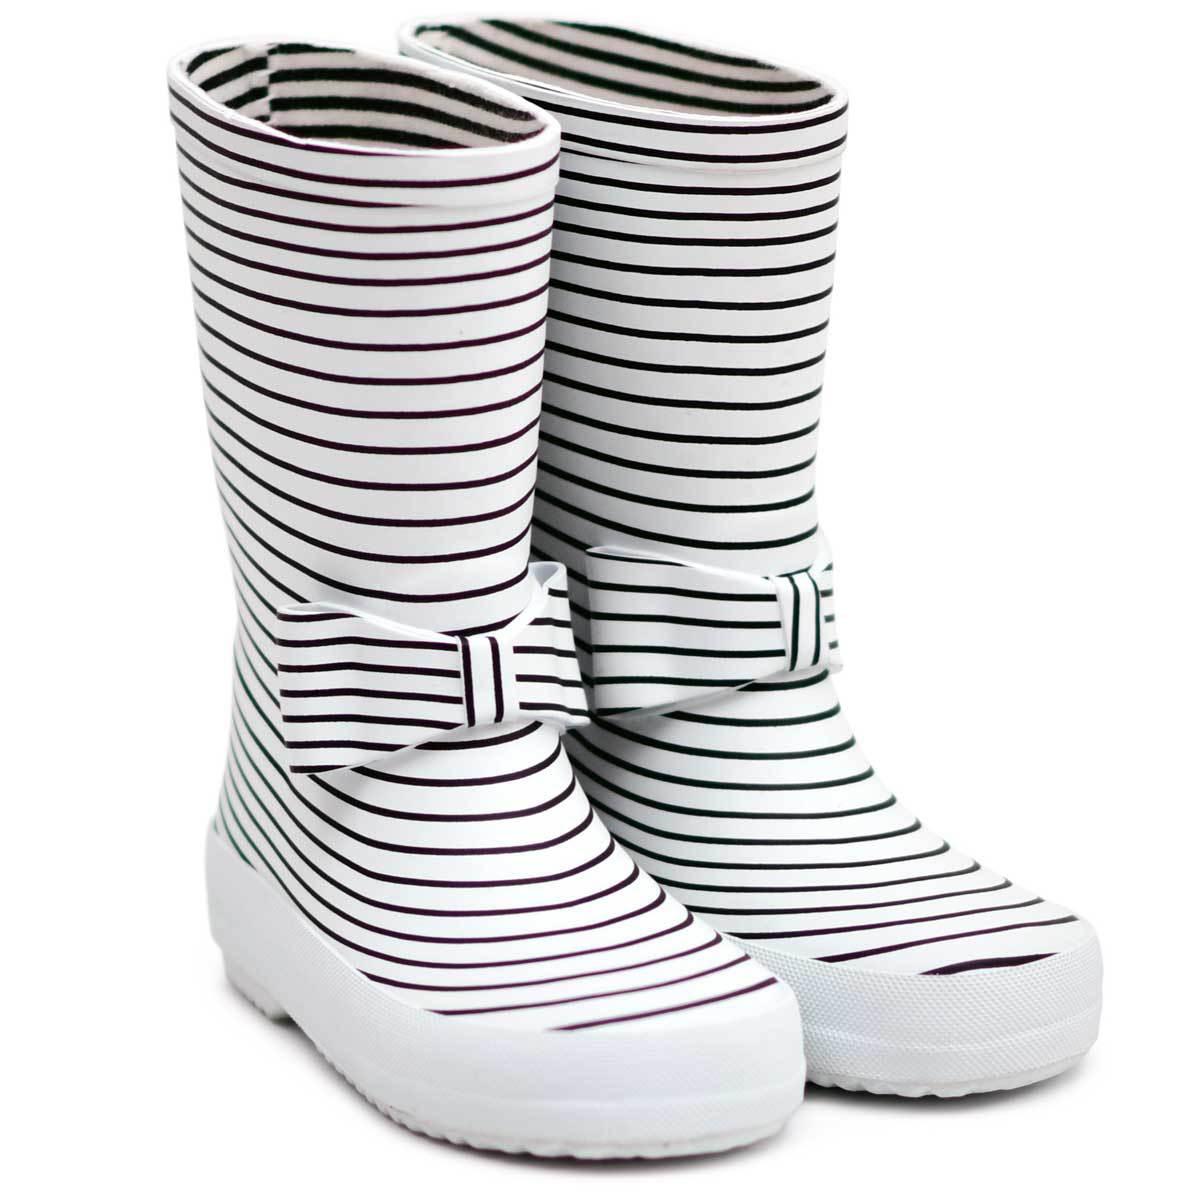 Chaussons & Chaussures Bottes Boxbonaute Bowtie - 23 Bottes Boxbonaute Bowtie - 23